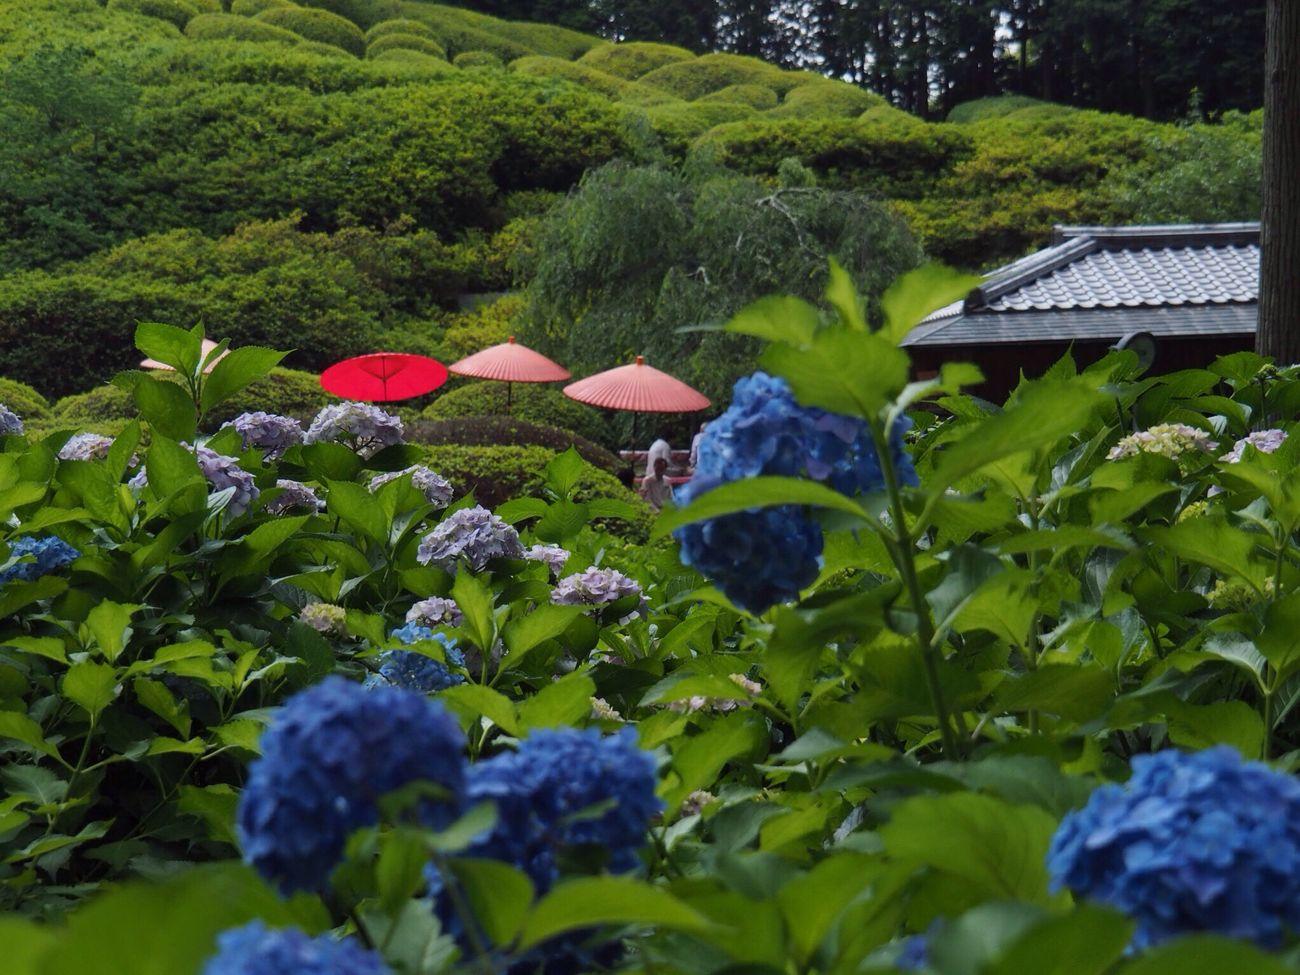 Kyoto Japan Uji Mimurotoji Temple Hydrangea Growth Plant Flower Nature Beauty In Nature Day Outdoors Umbrella Japanese Style Green Olympus PEN-F 京都 日本 宇治 三室戸寺 紫陽花 10,000株の紫陽花